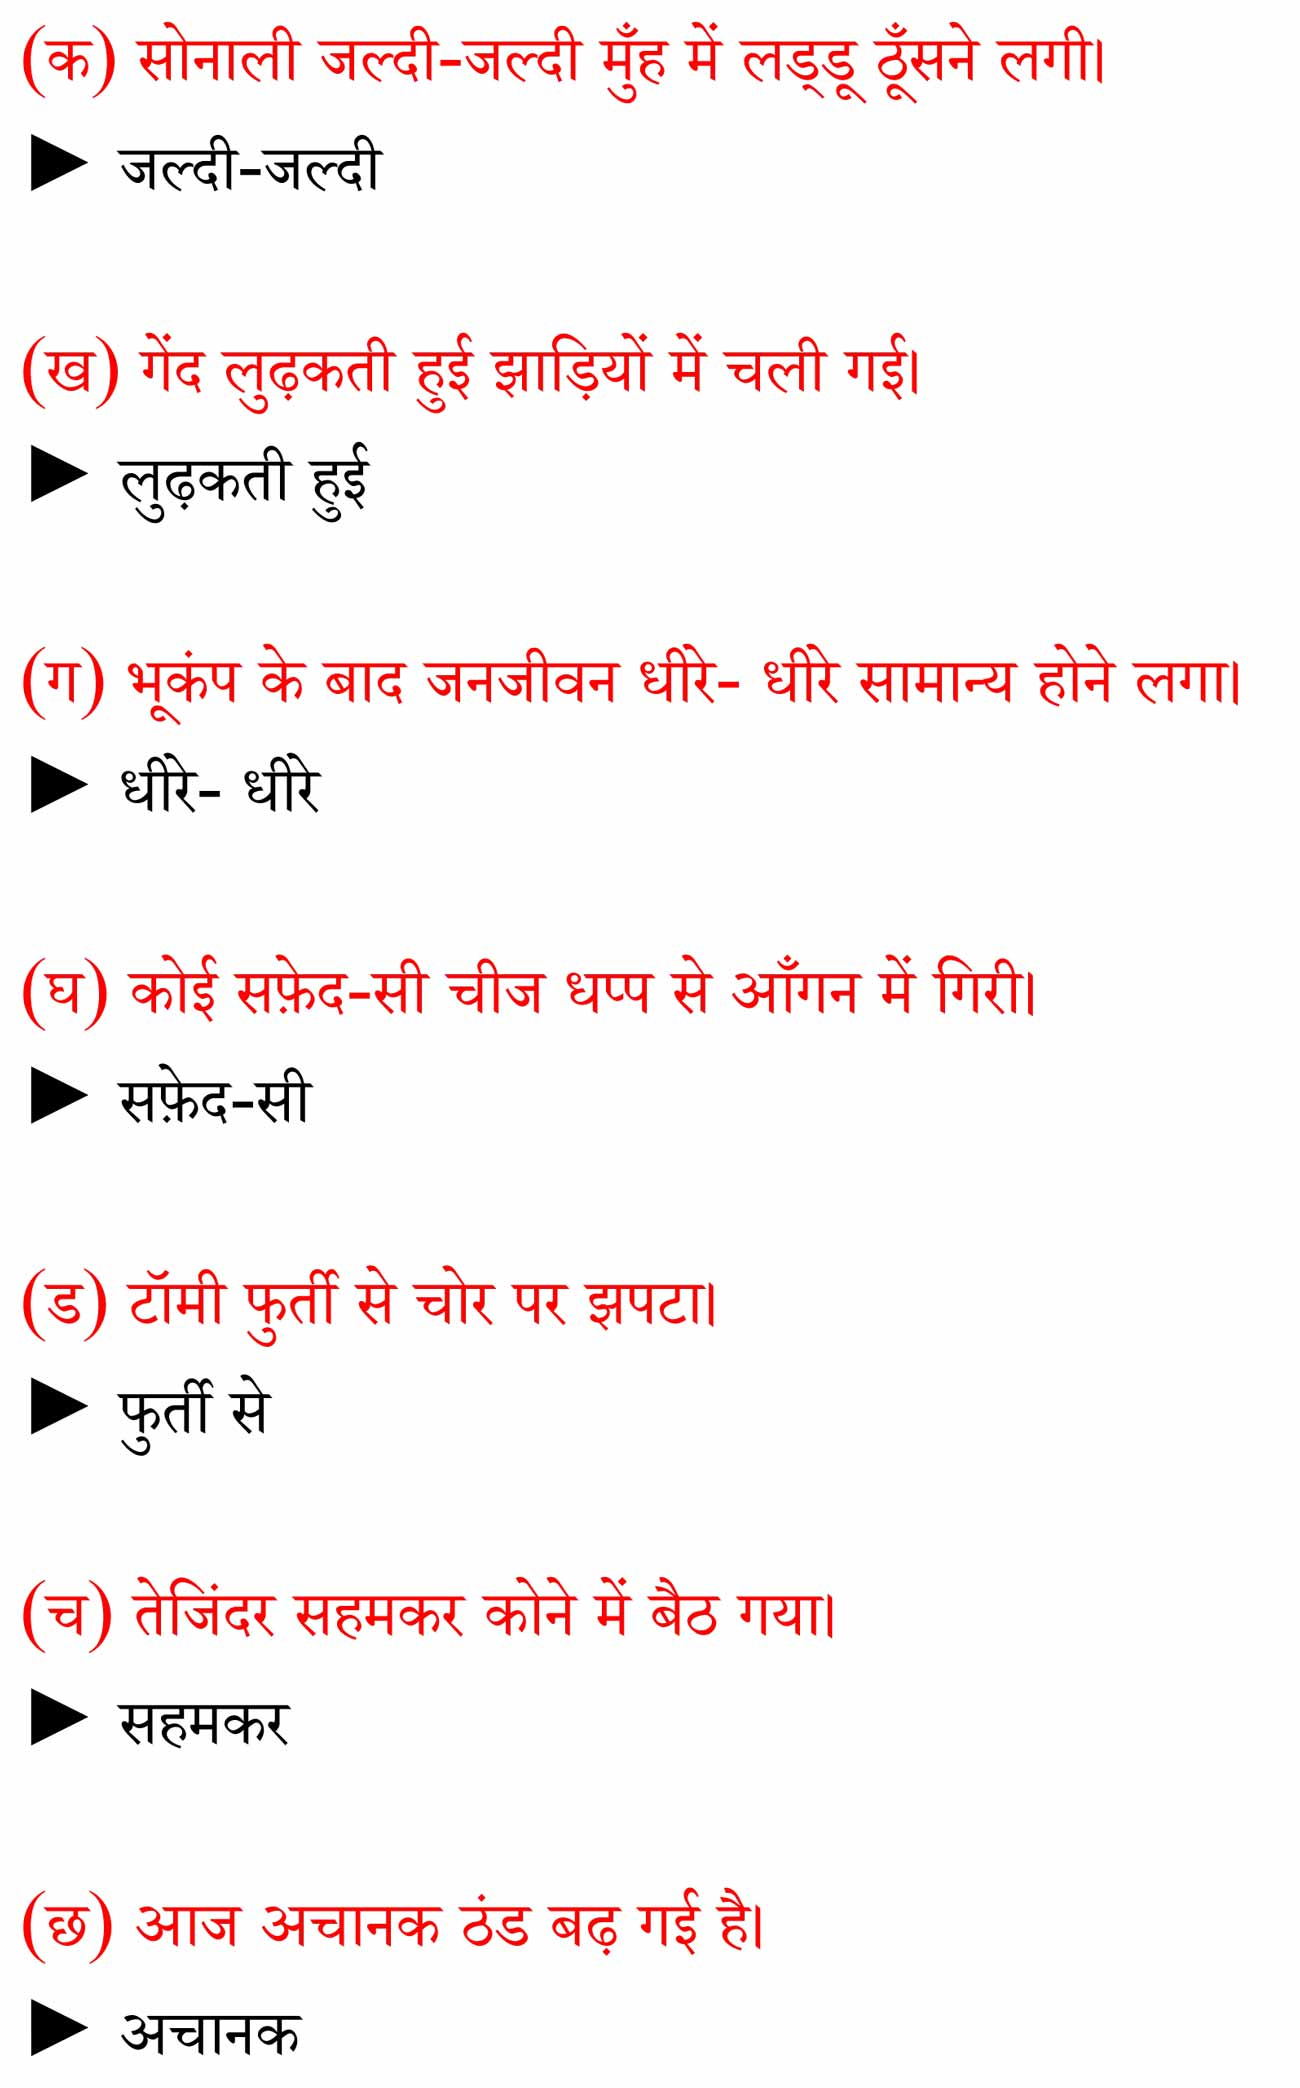 NCERT Solutions For Class 6 Hindi Vasant - Chapter 1 वह